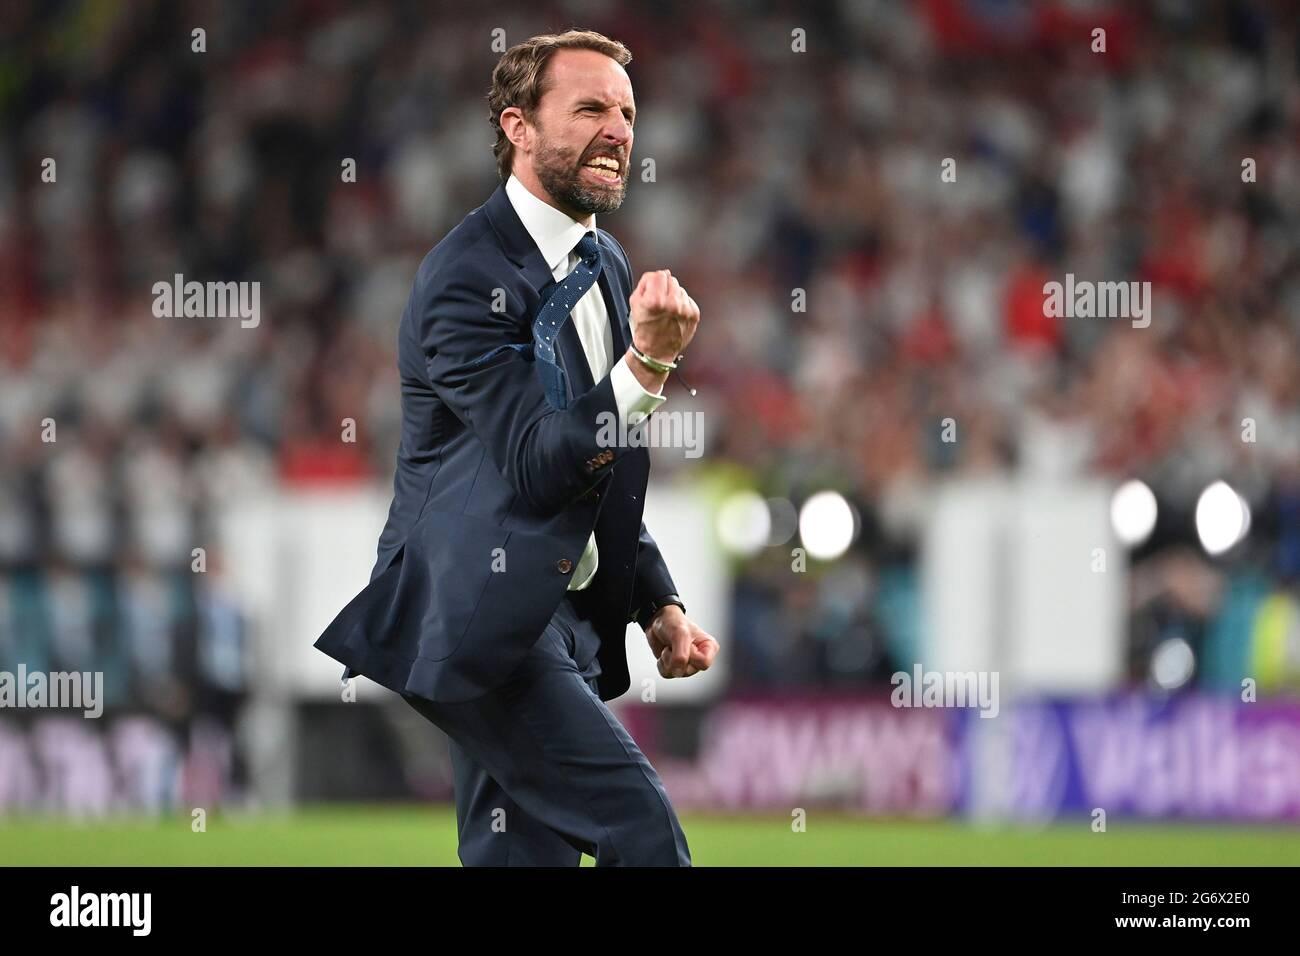 final jubilation Gareth SOUTHGATE (coach ENG), jubilation, joy, enthusiasm, single image, trimmed single motif, half figure, half figure, semifinals, game M50, England (ENG) - Denmark (DEN) 2-1 nV on 07.07.2021 in London/Wembley Stadium. Football EM 2020 from 06/11/2021 to 07/11/2021. Stock Photo